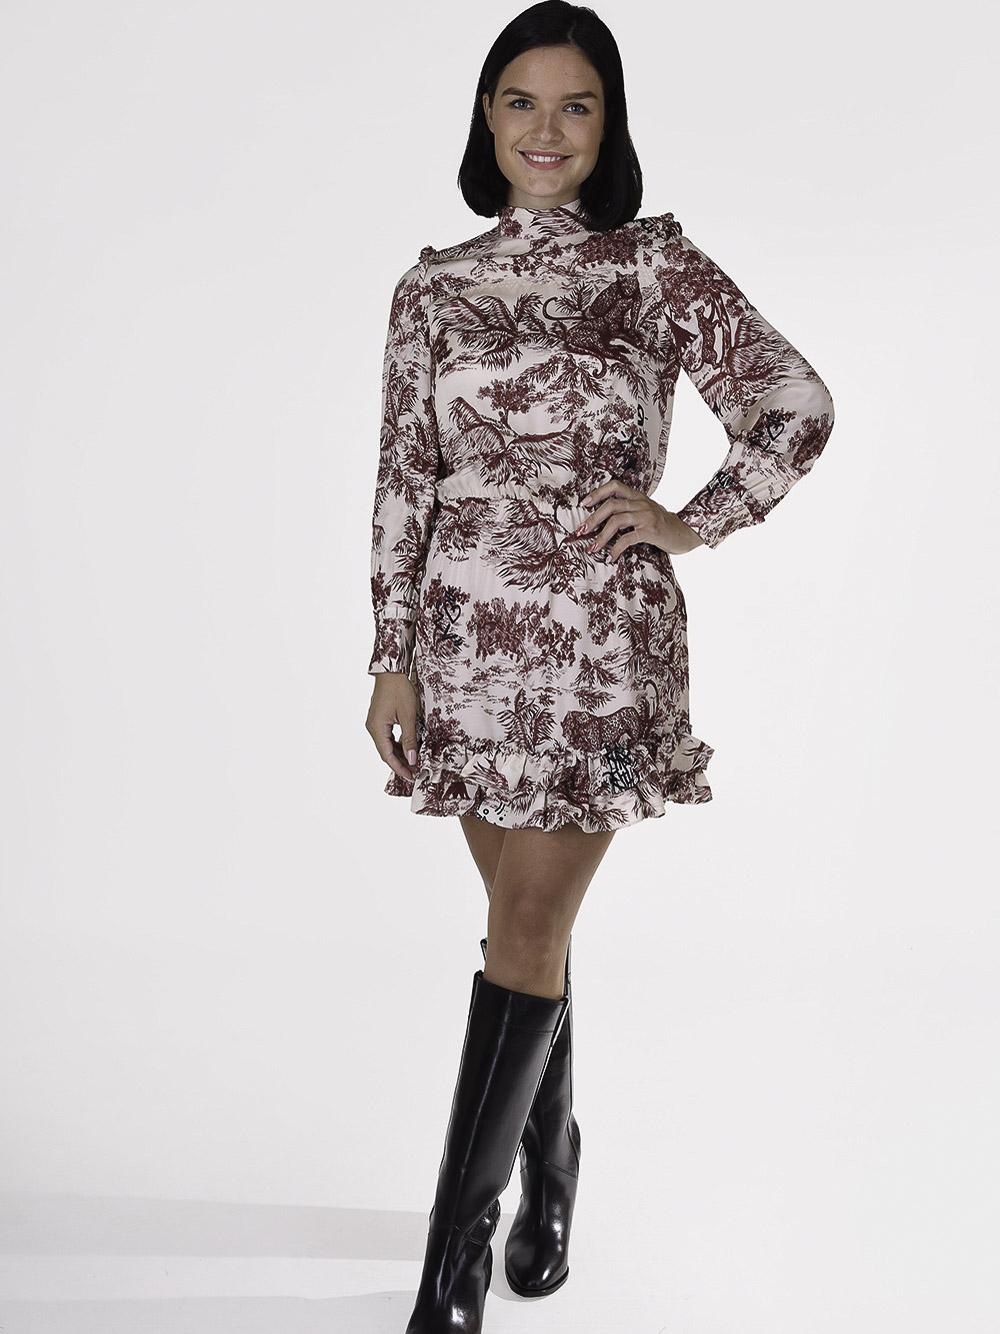 ZADIG & VOLTAIRE Φόρεμα κοντό WJCDO403F ΜΠΟΡΝΤΩ